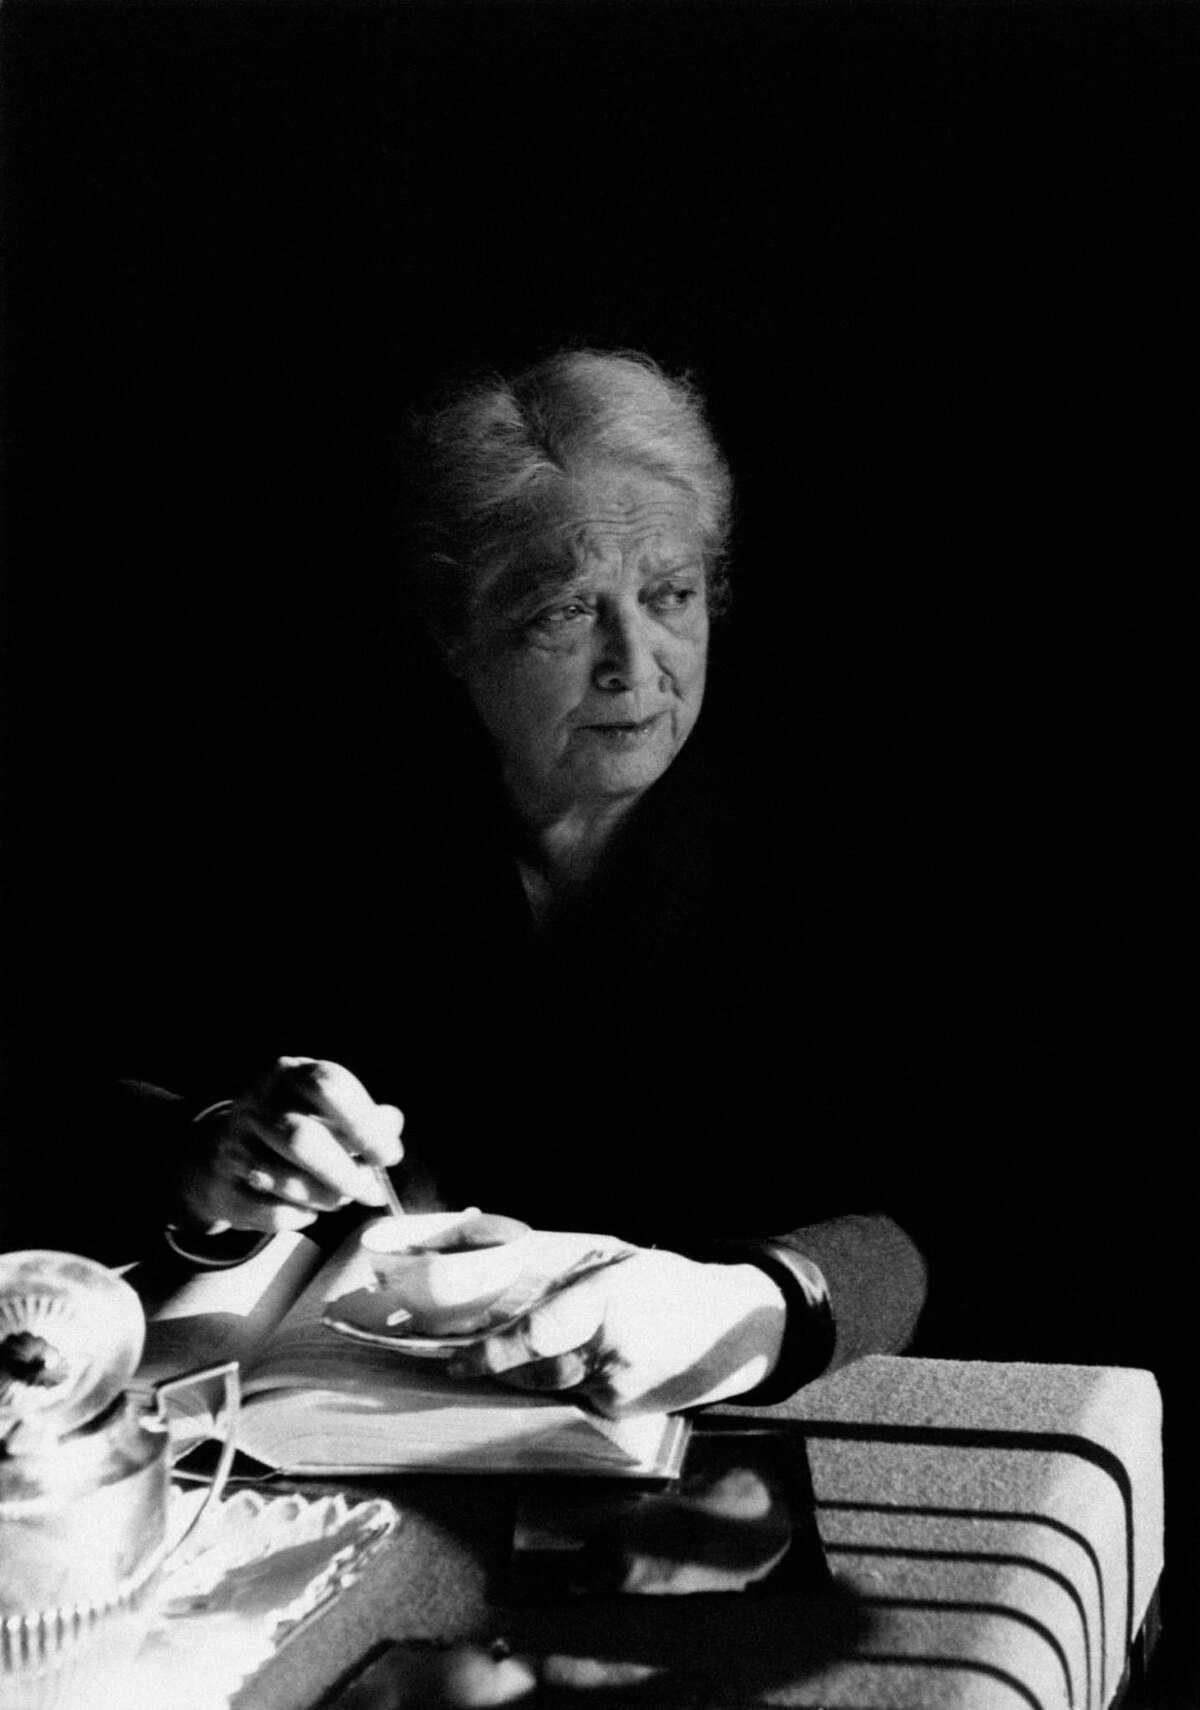 Italian food scholar Ada Boni sits at a table drinking coffee in 1960.